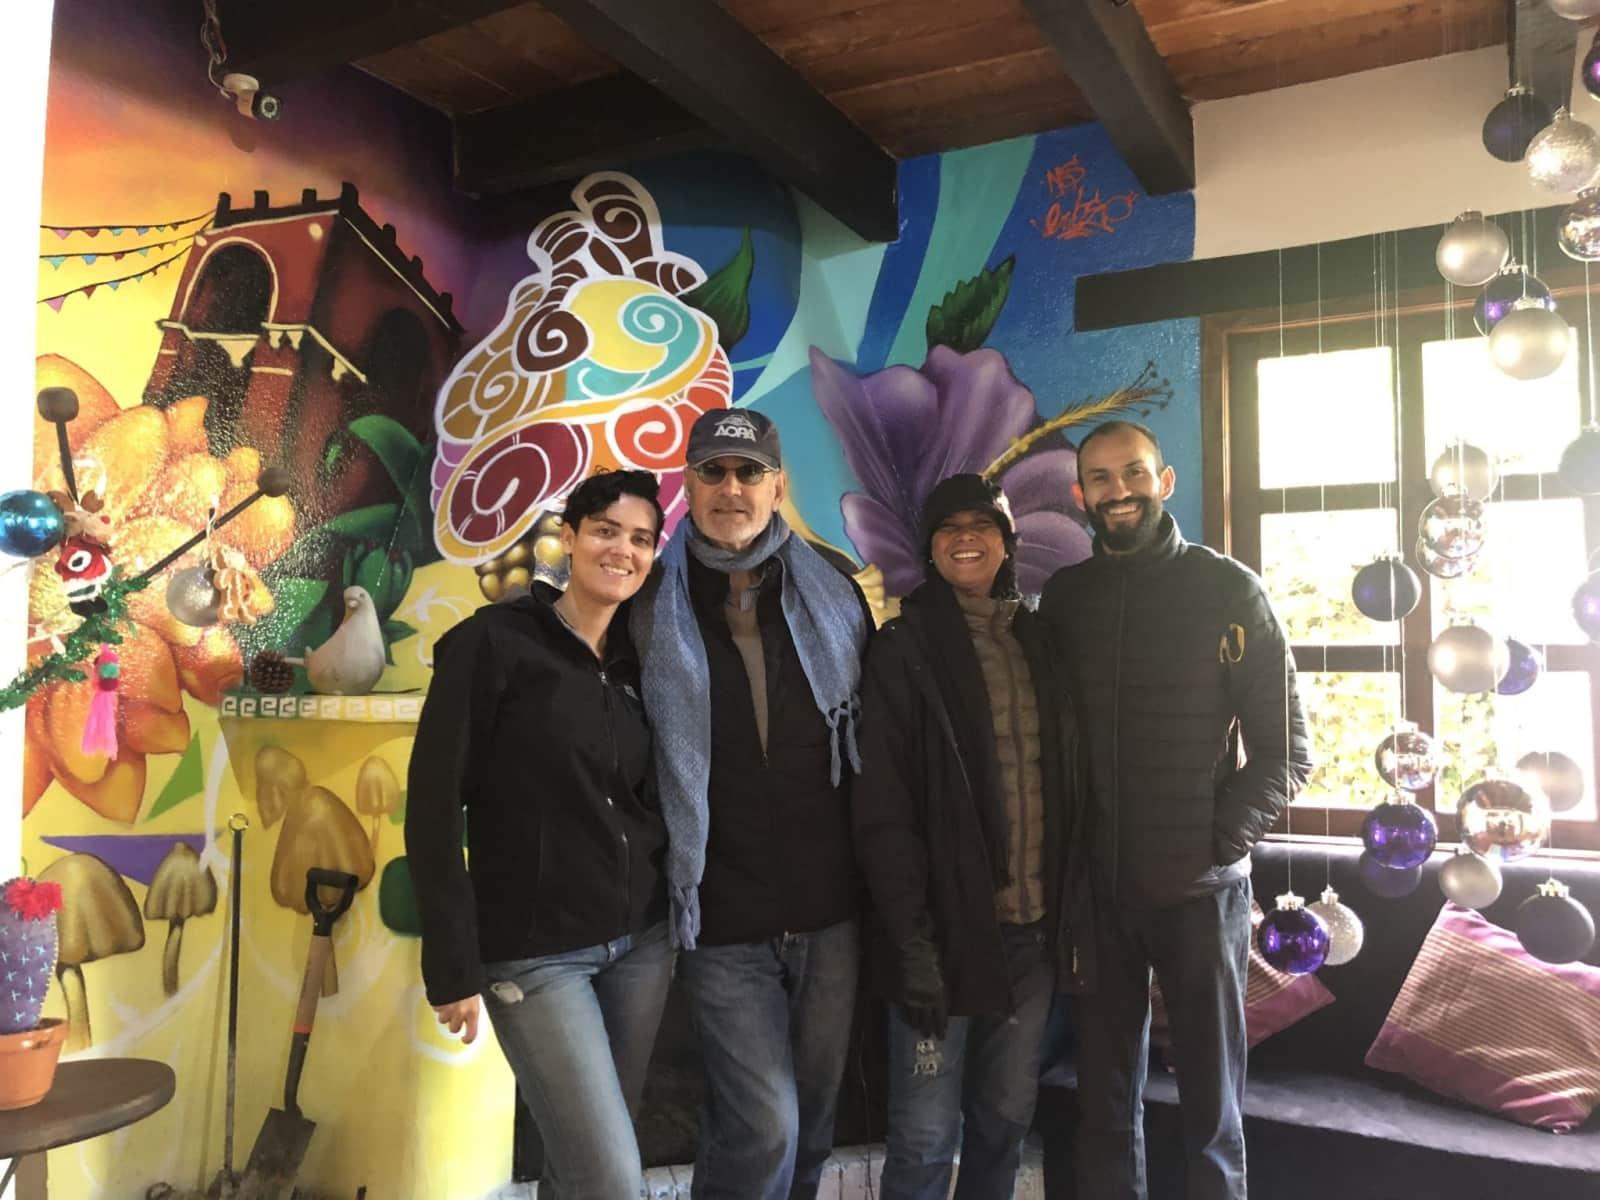 Daphne asha & Terry from Mexico City, Mexico